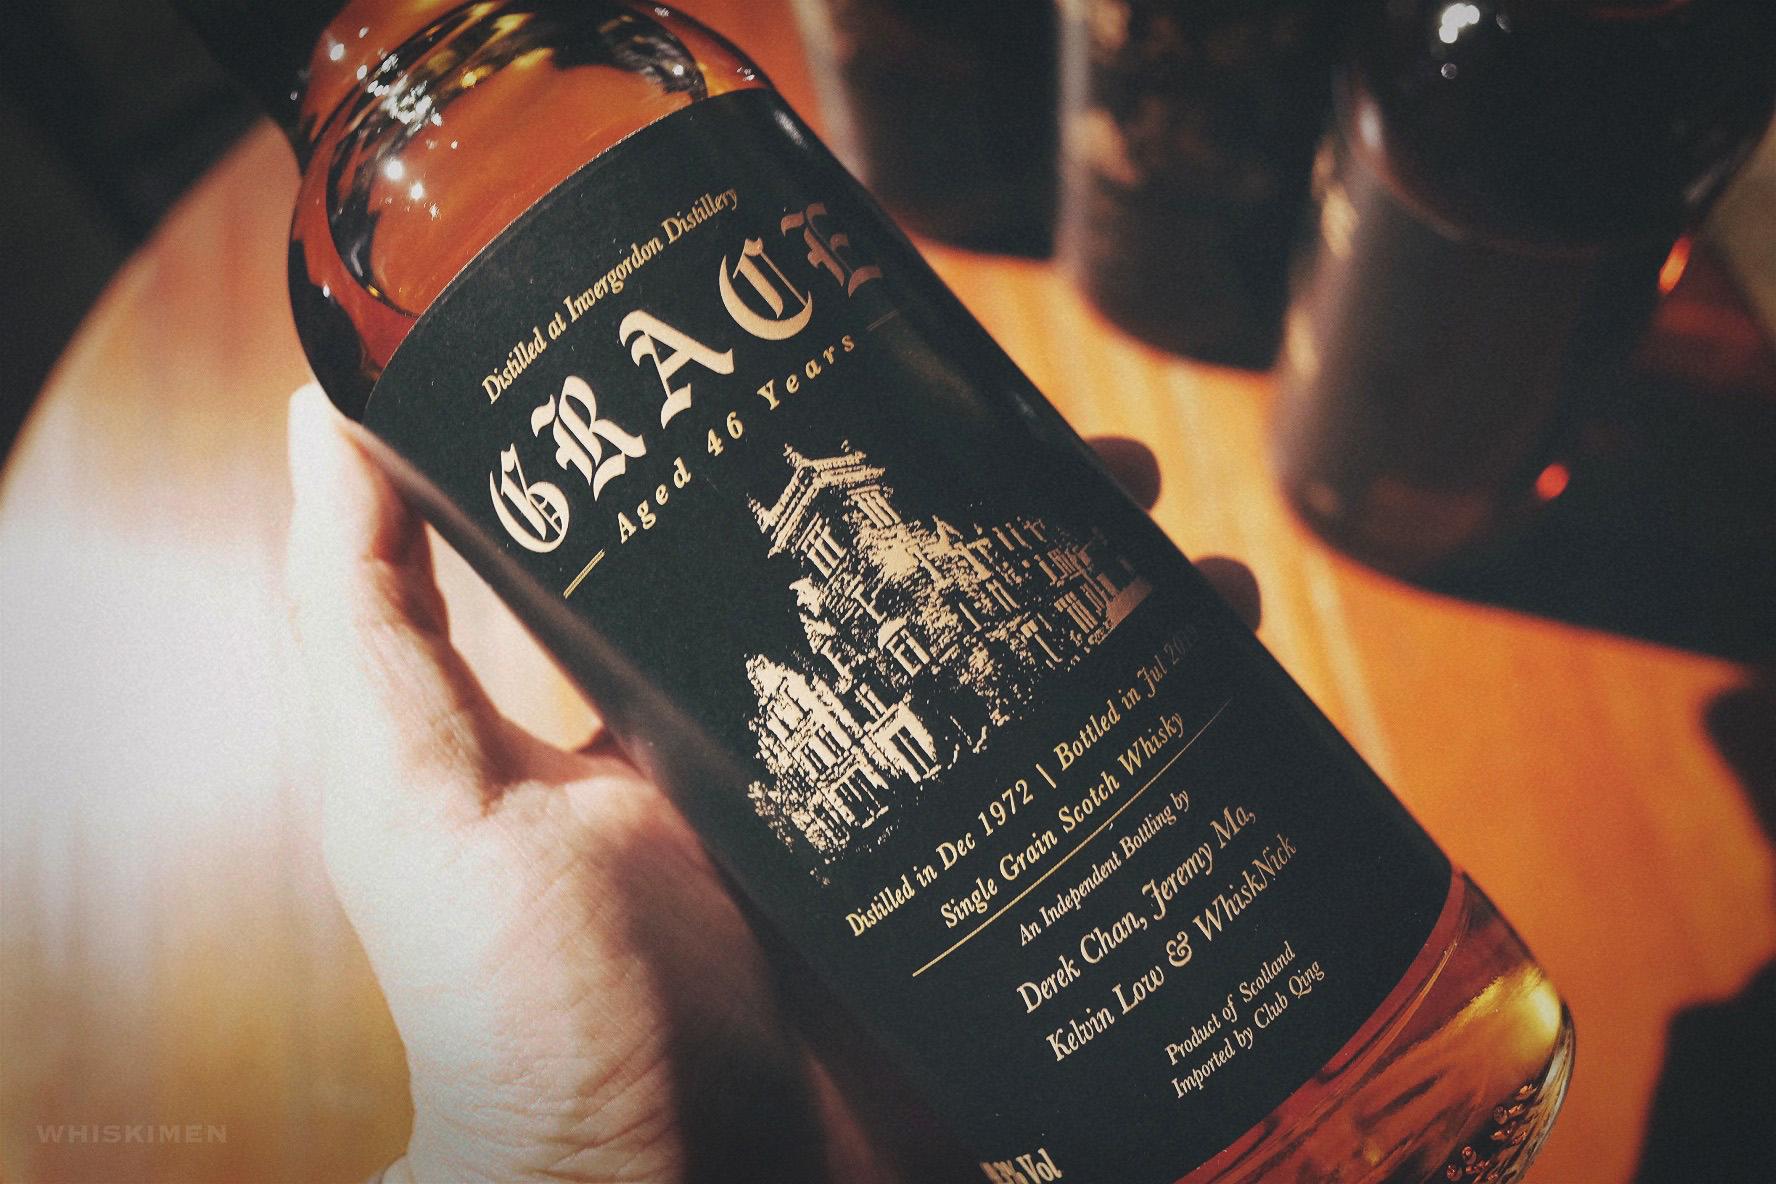 Invergordon 1972 46 Year Old Single Grain Scotch Whisky, 2019, highland, Derek Chan, Jeremy Ma, Kelvin Low, WhiskNick, Club Qing, Grace, hong kong, 香港